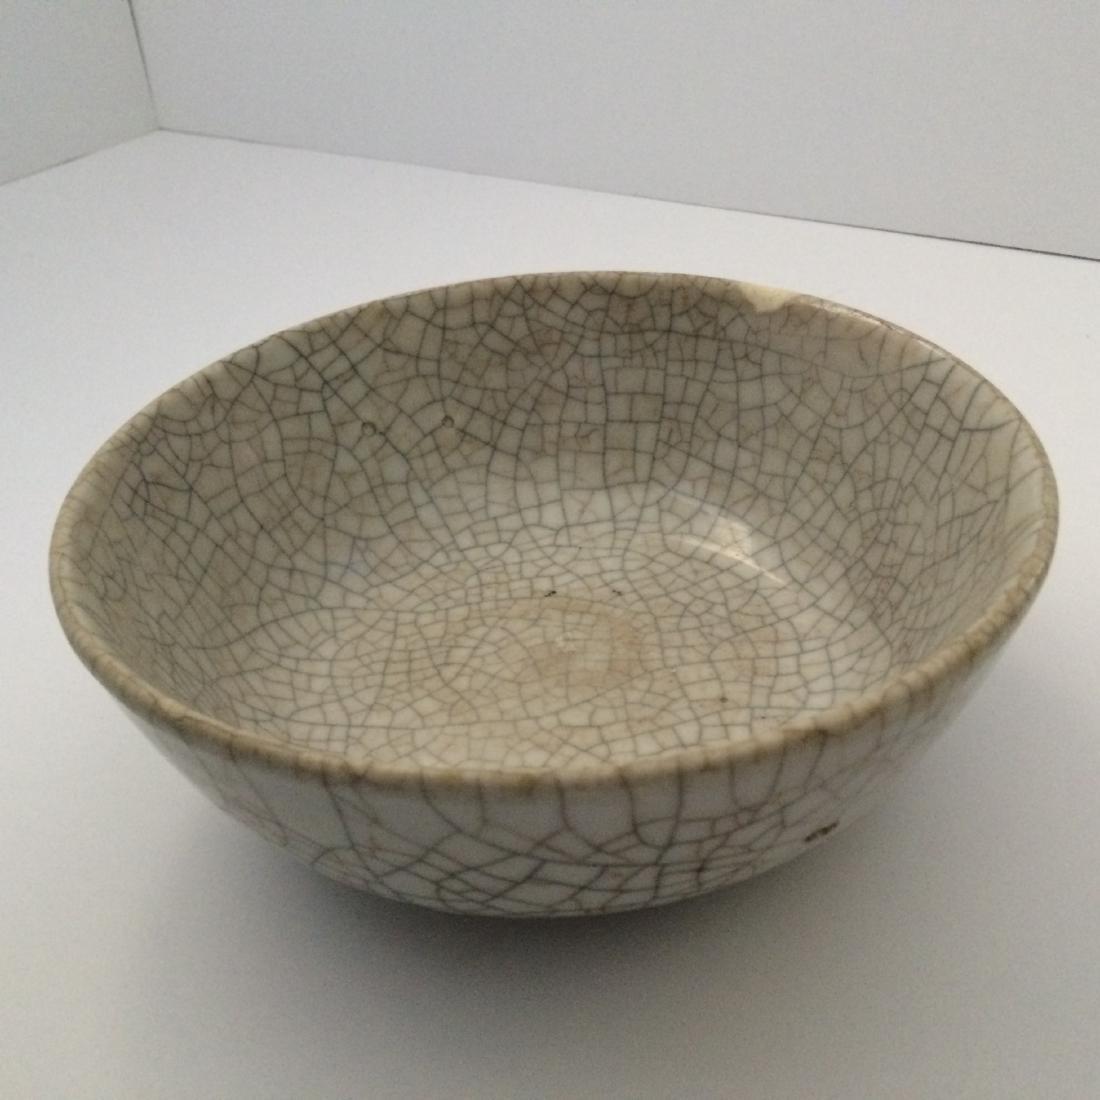 "Old Ge Ware Crackle Glaze Bowl, Cheng Hua (7.5""Dia)"